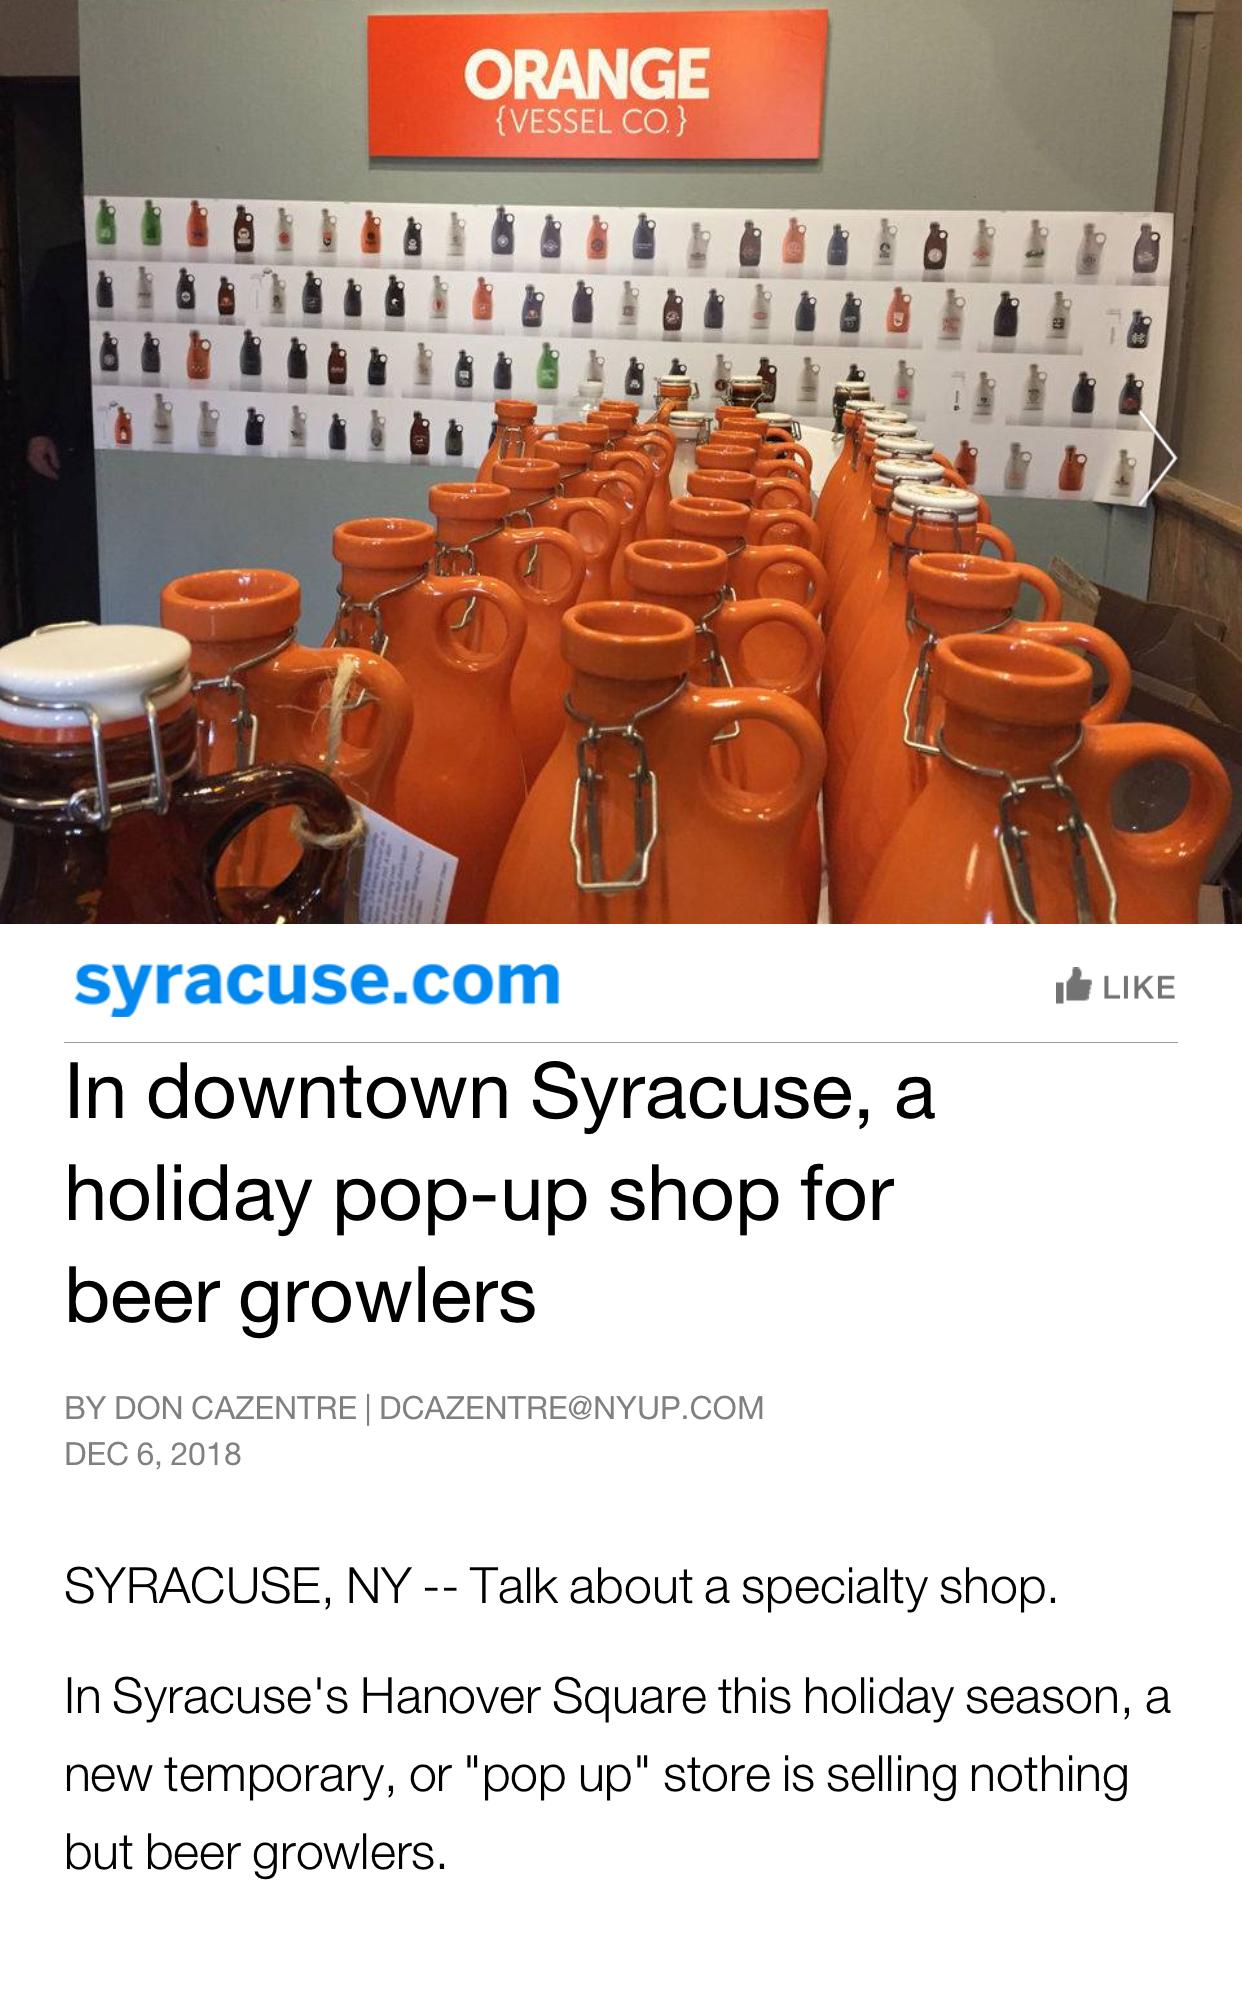 Orange-Vessel-Holiday-Pop-Up-Shop-2018-Syracuse-NY-Rob-Englert-Steve-Tarolli-Don-Cazentre.jpg